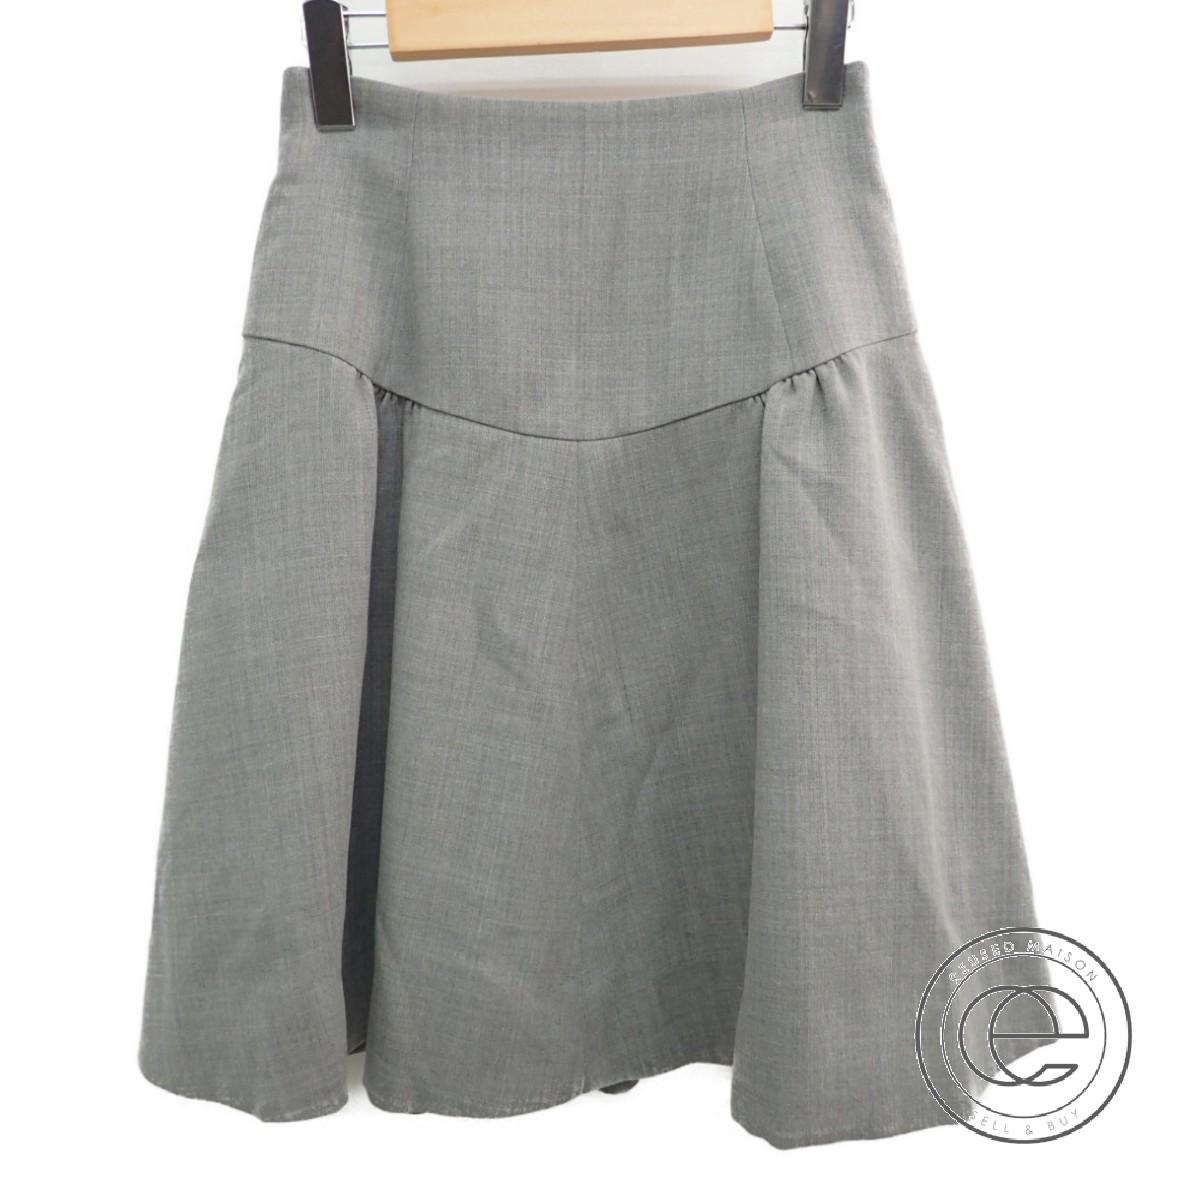 FOXEY フォクシー 30920 モンサンミッシェル 裏地付 フレア スカート 38 ソフィーグレー レディース 【中古】